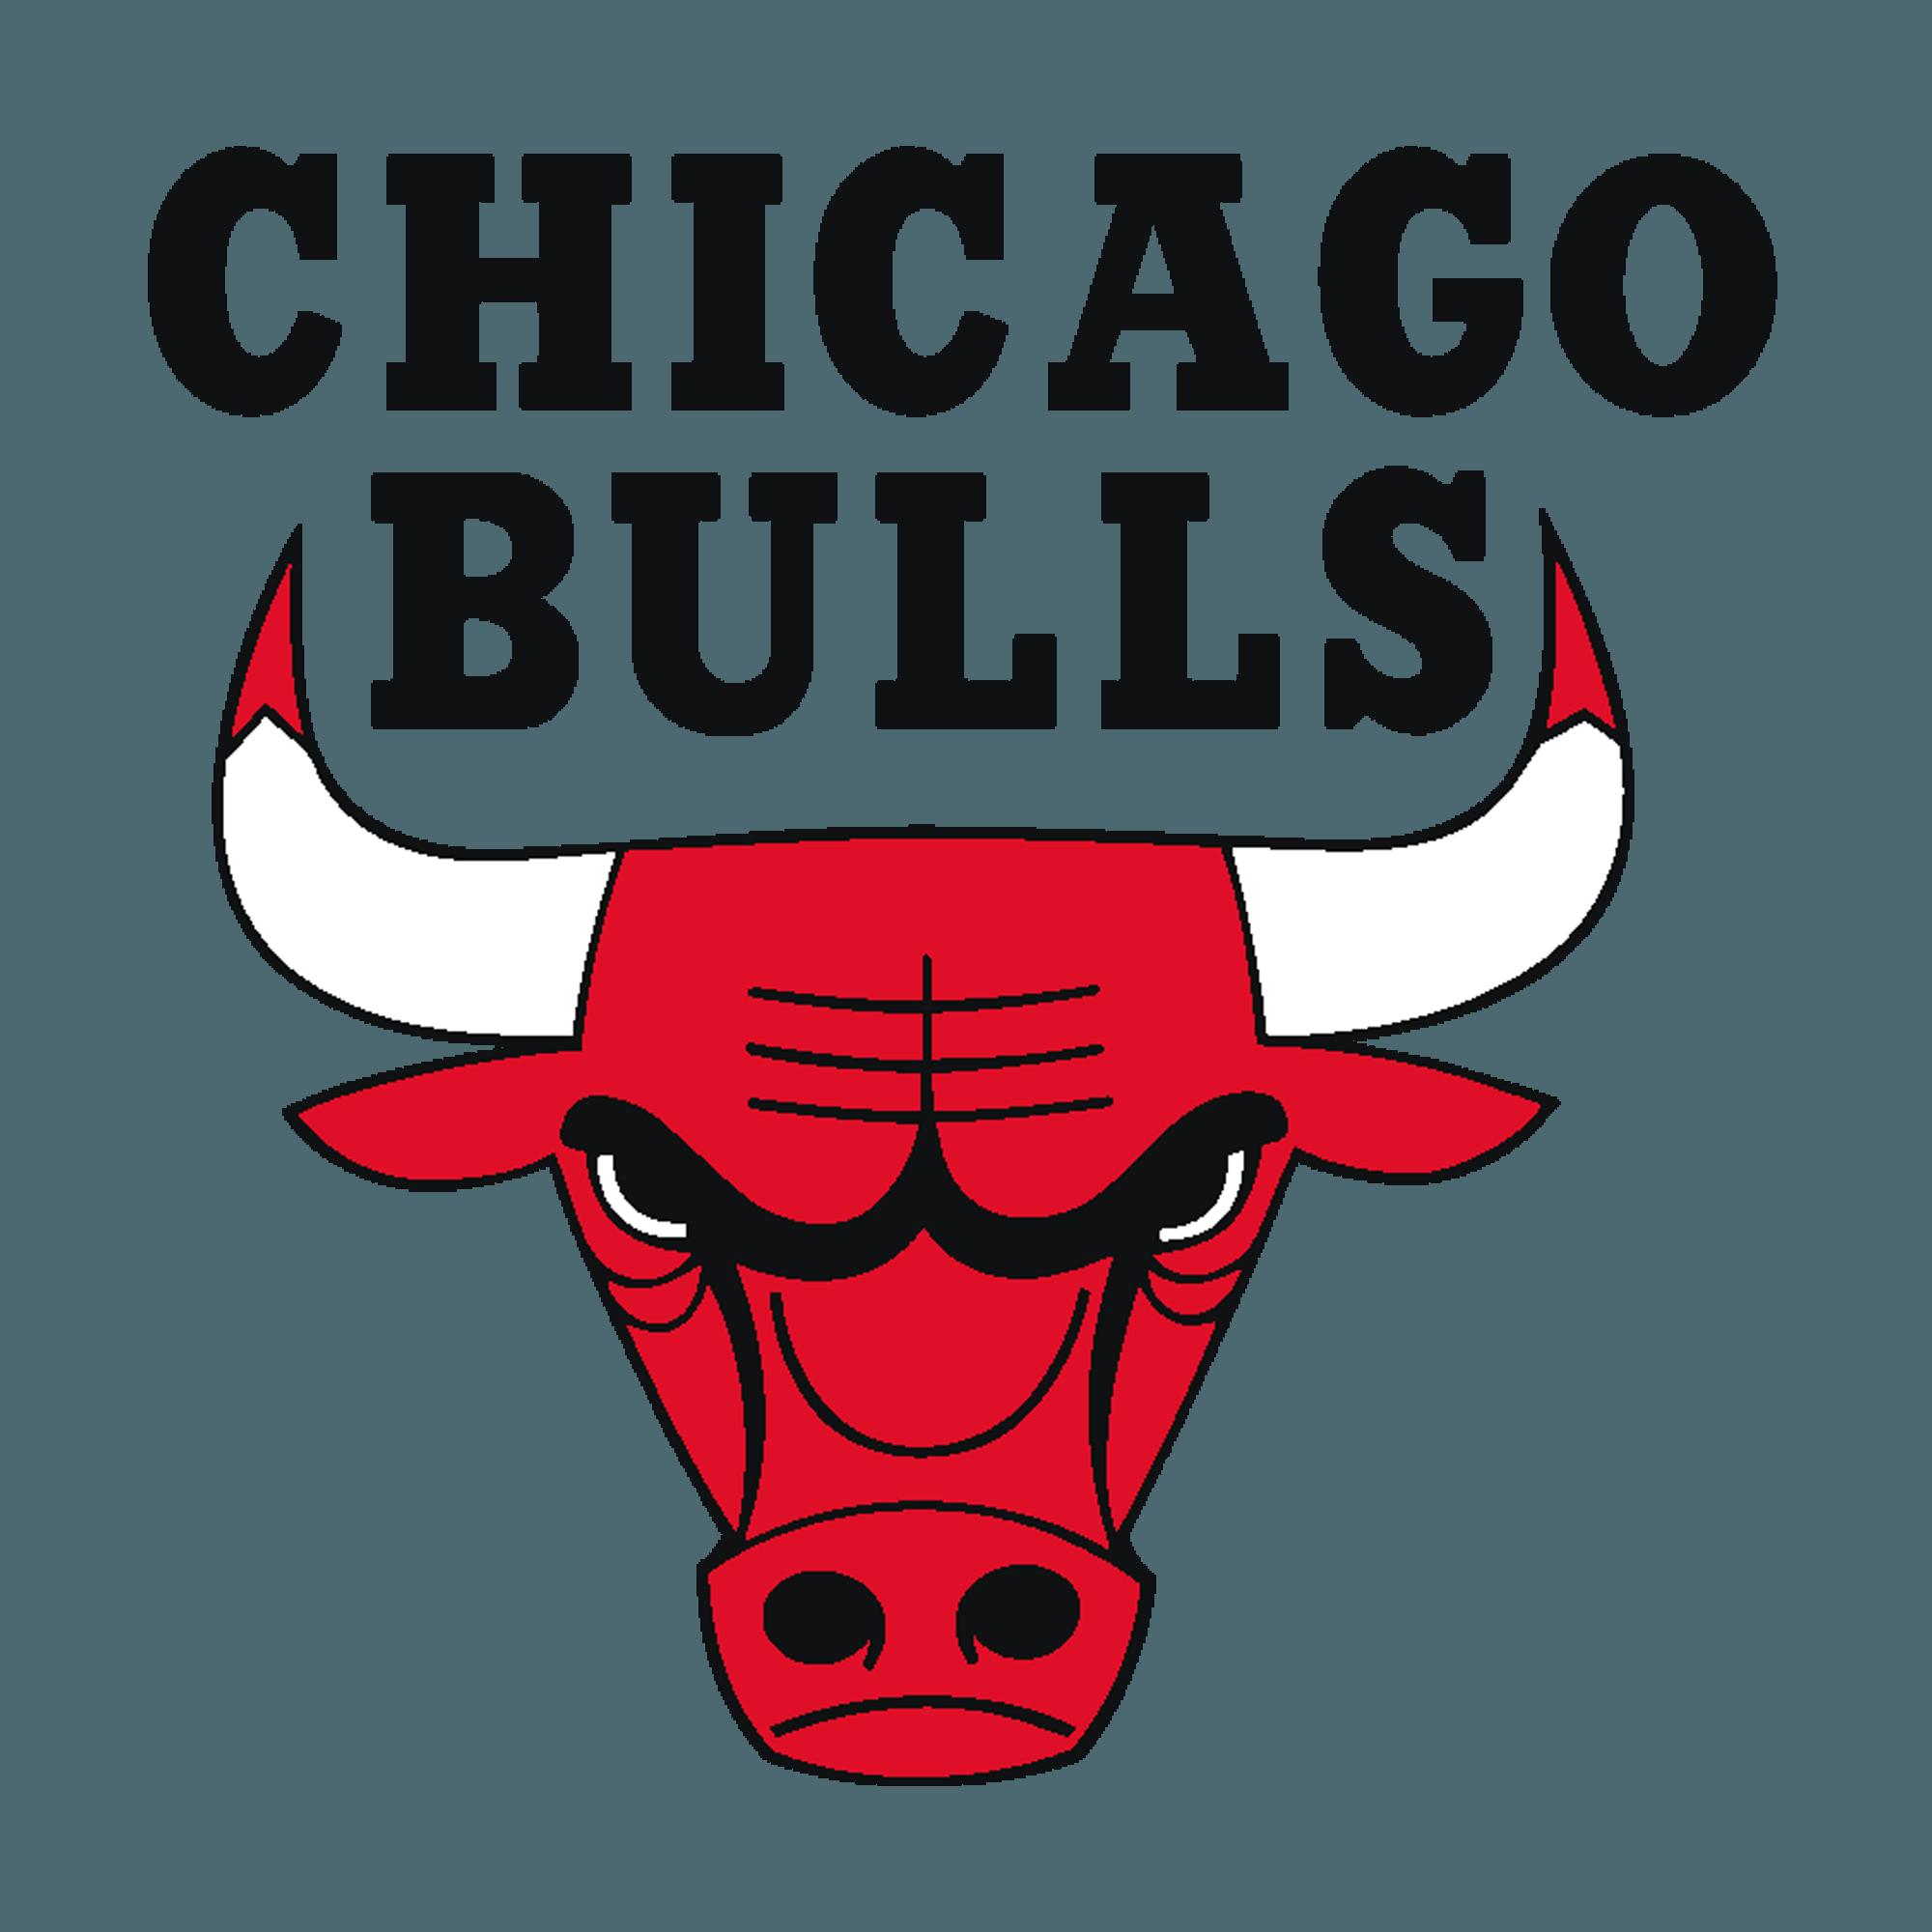 Chicago Bulls Logo 43 99150 Images HD Wallpapers| Wallfoy.com (עברית)